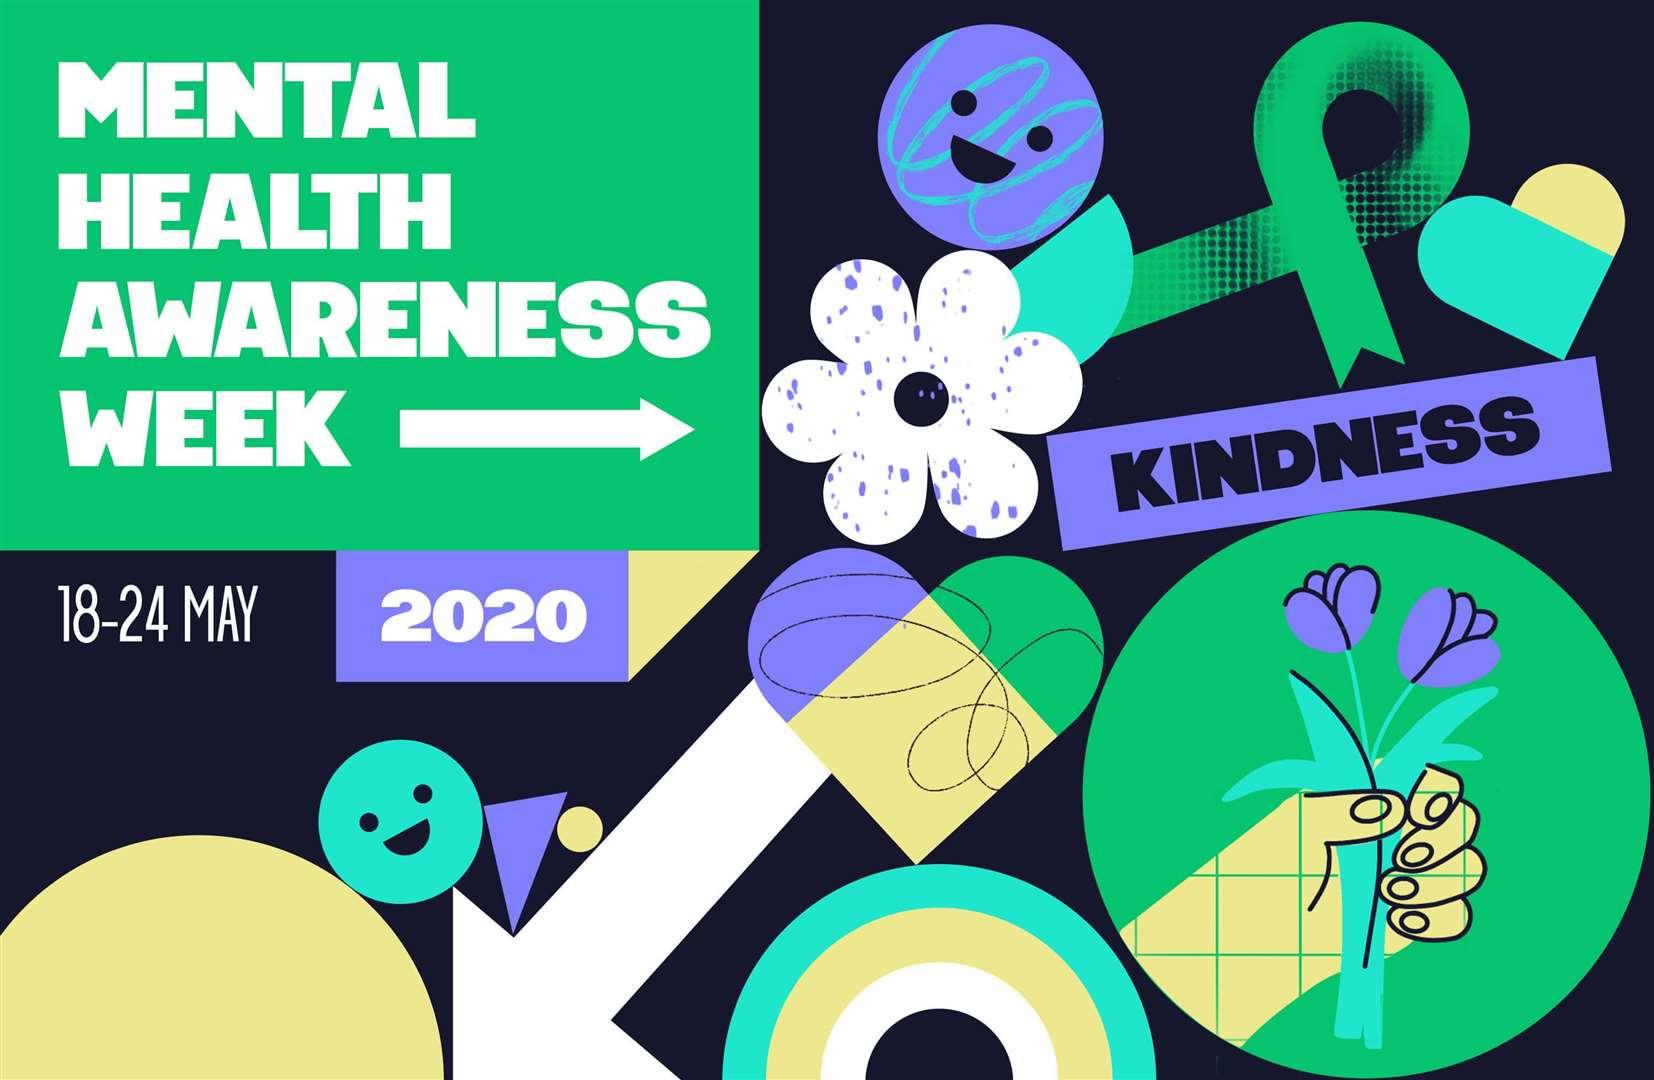 Oxford City Council marks Mental Health Awareness Week